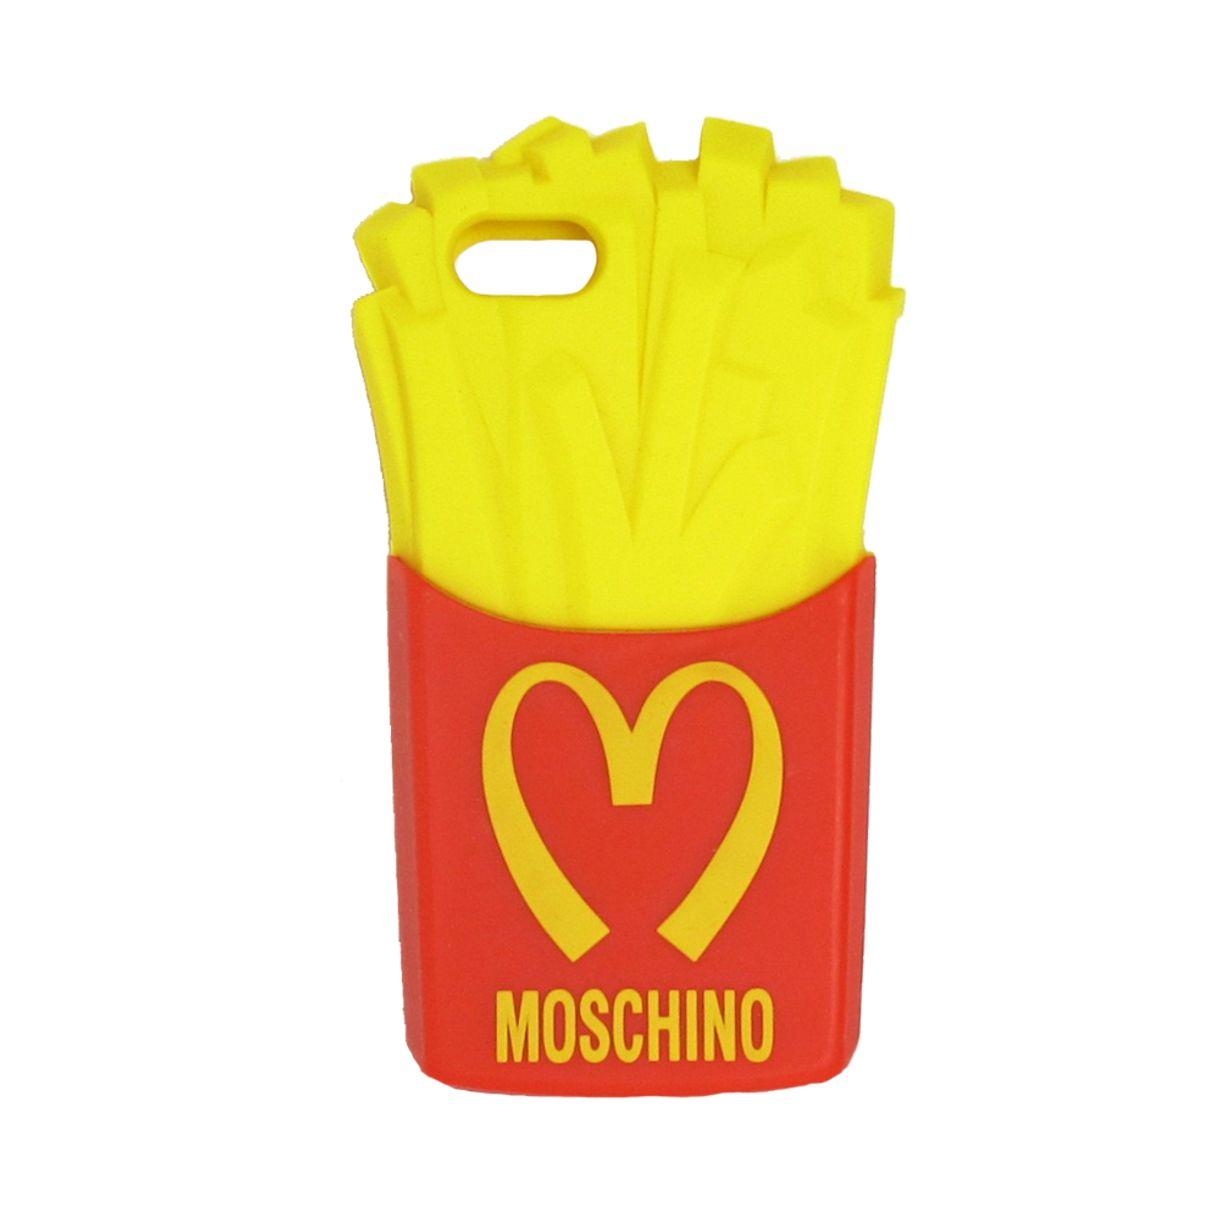 Capinha-Moschino-iPhone-5-French-Fries